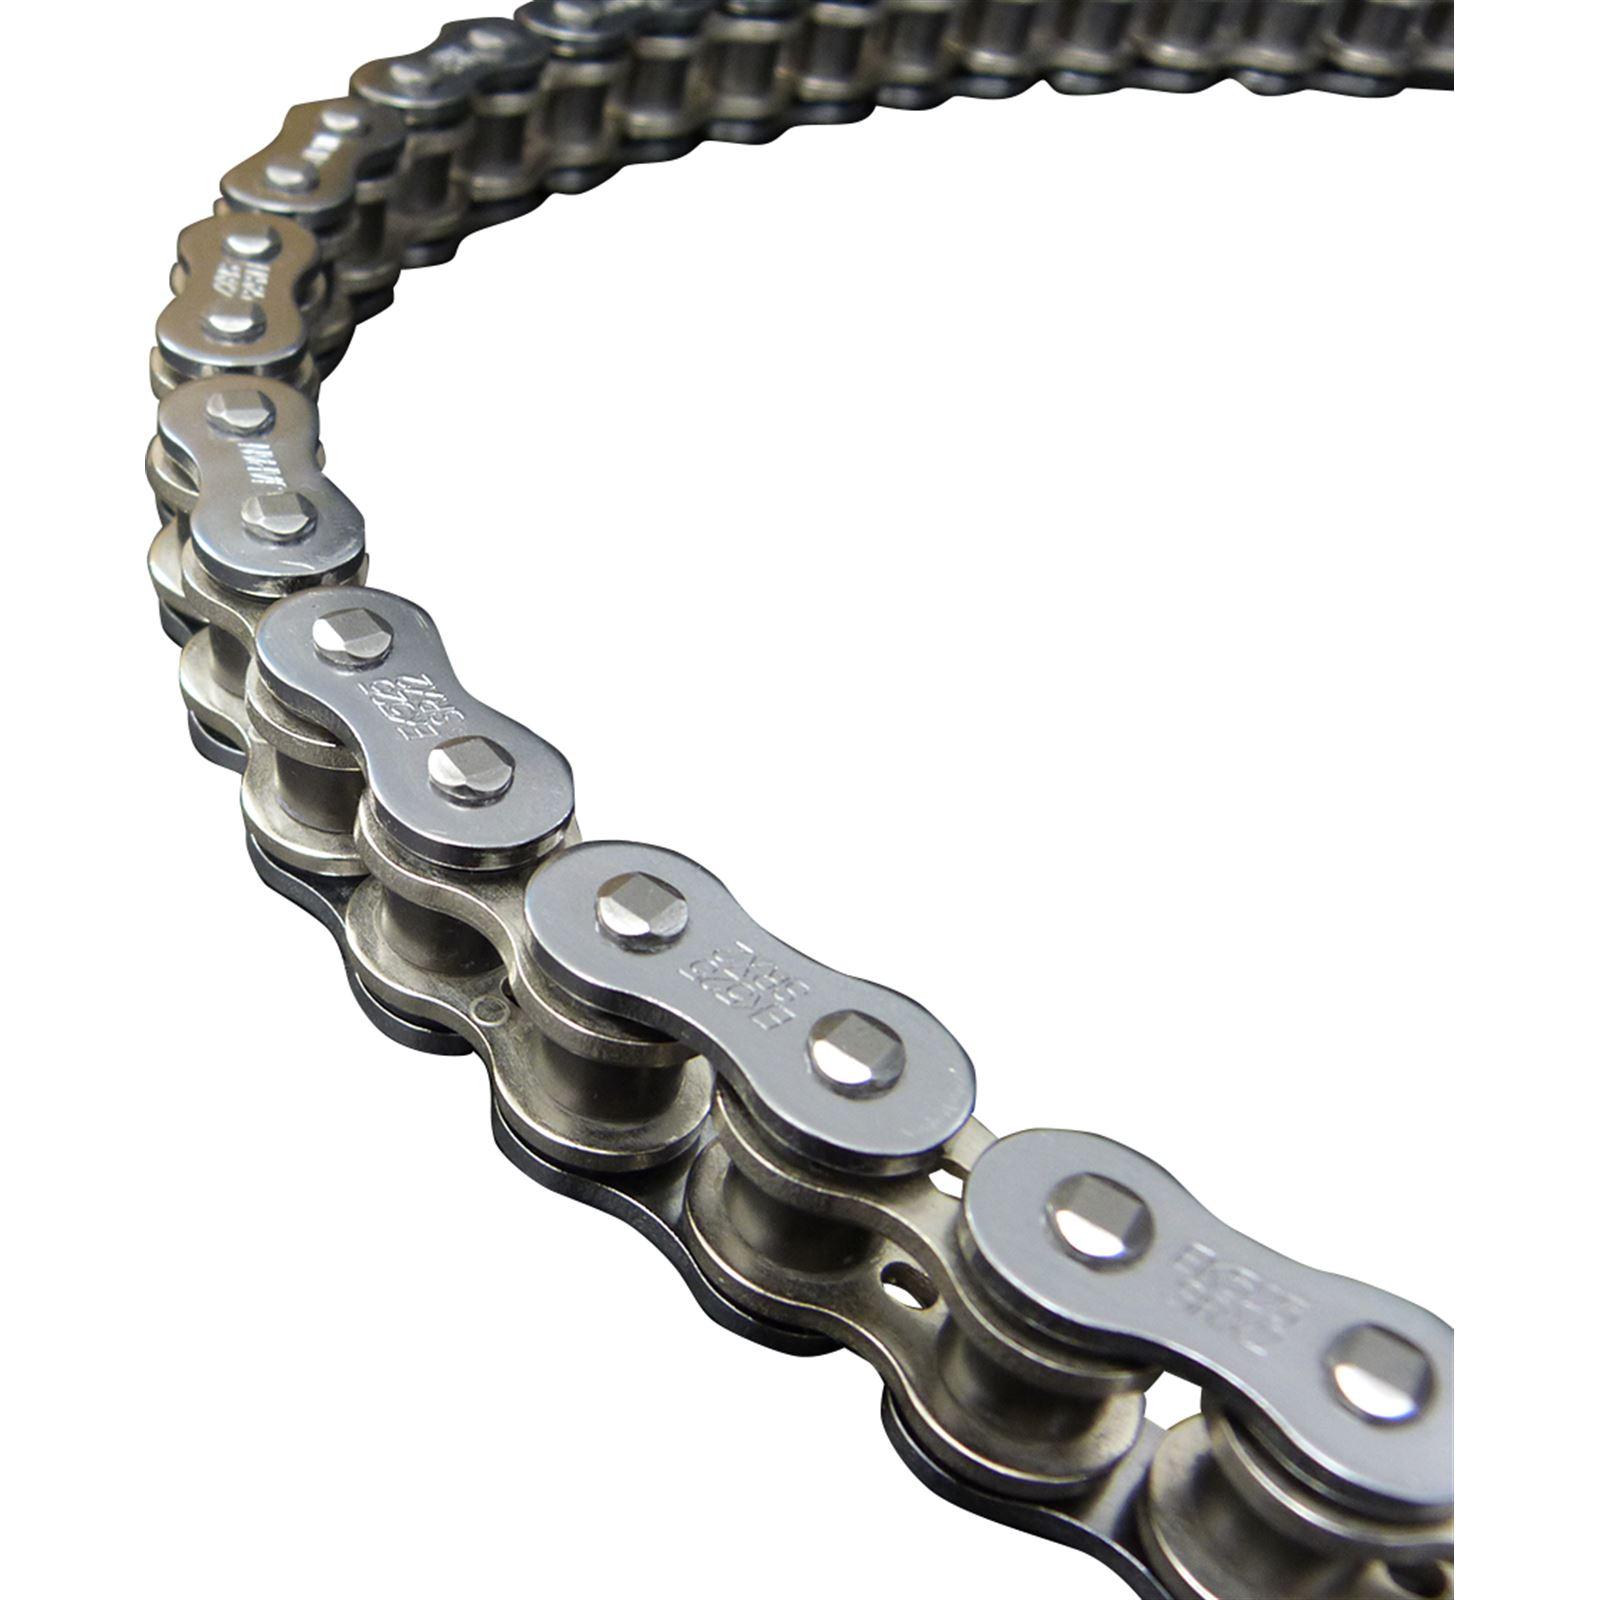 EK 530 SRX2 - Chain - 104 Links